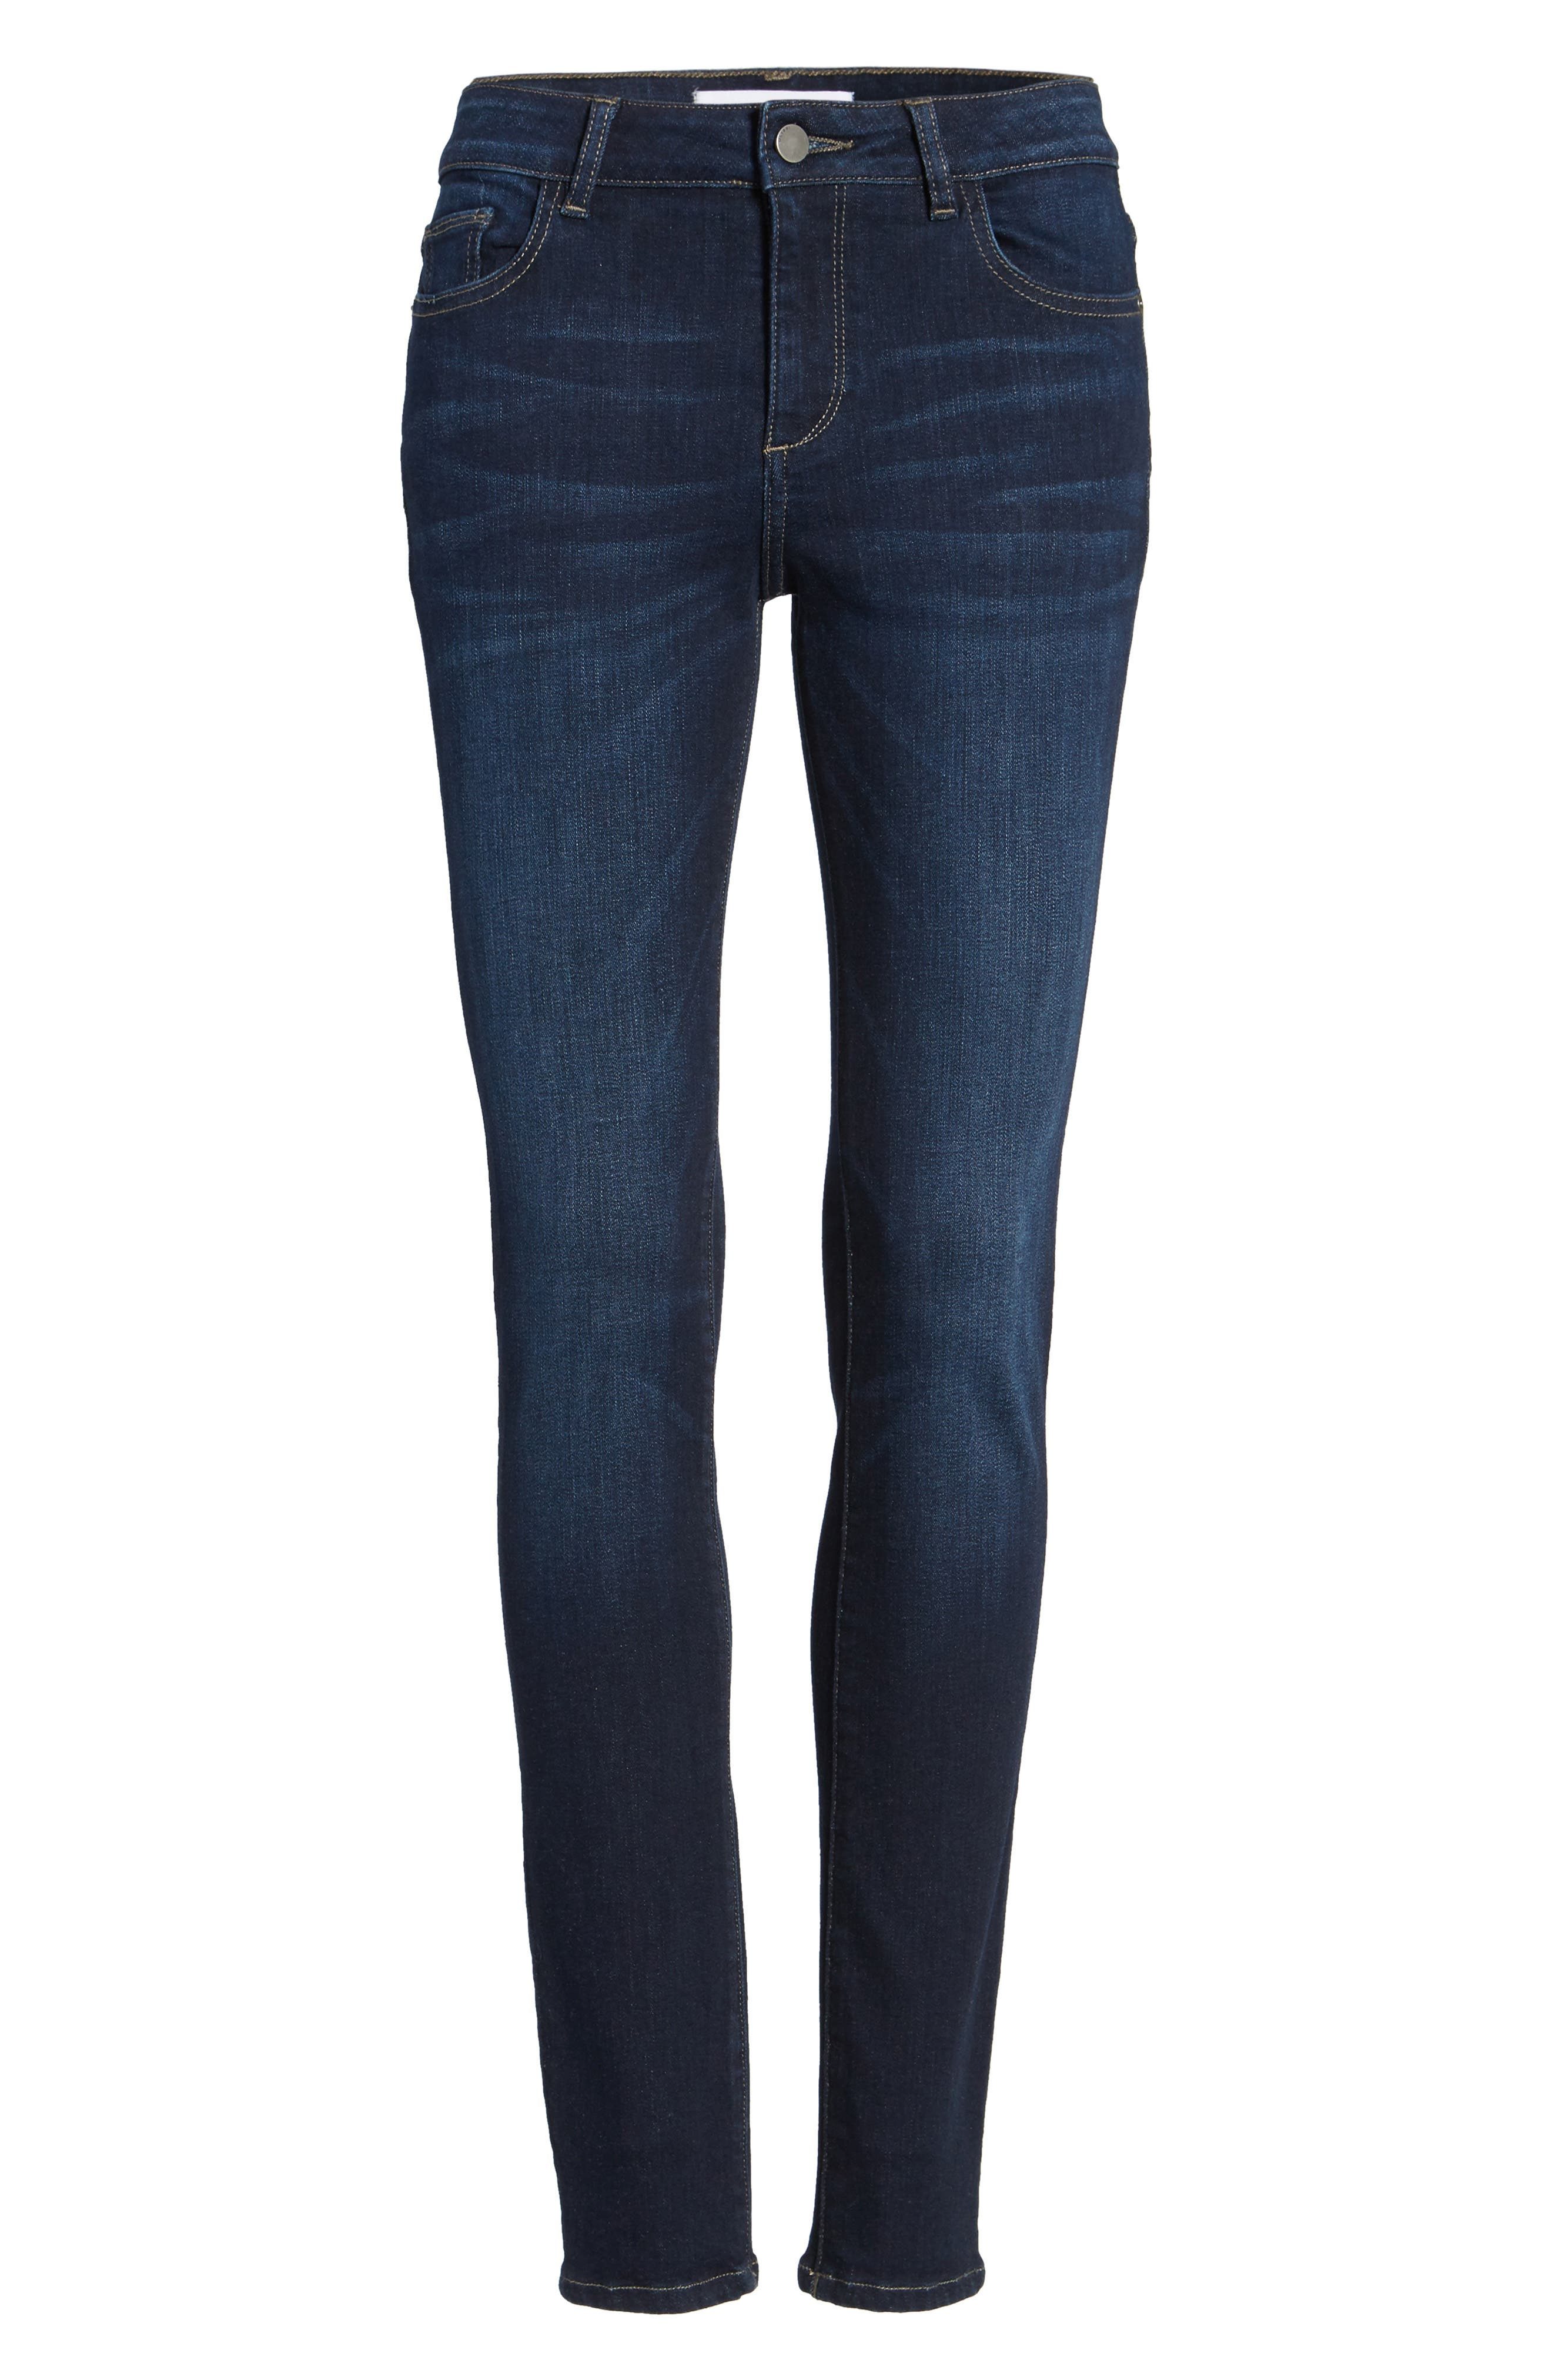 Florence Instasculpt Skinny Jeans,                             Alternate thumbnail 7, color,                             Crux